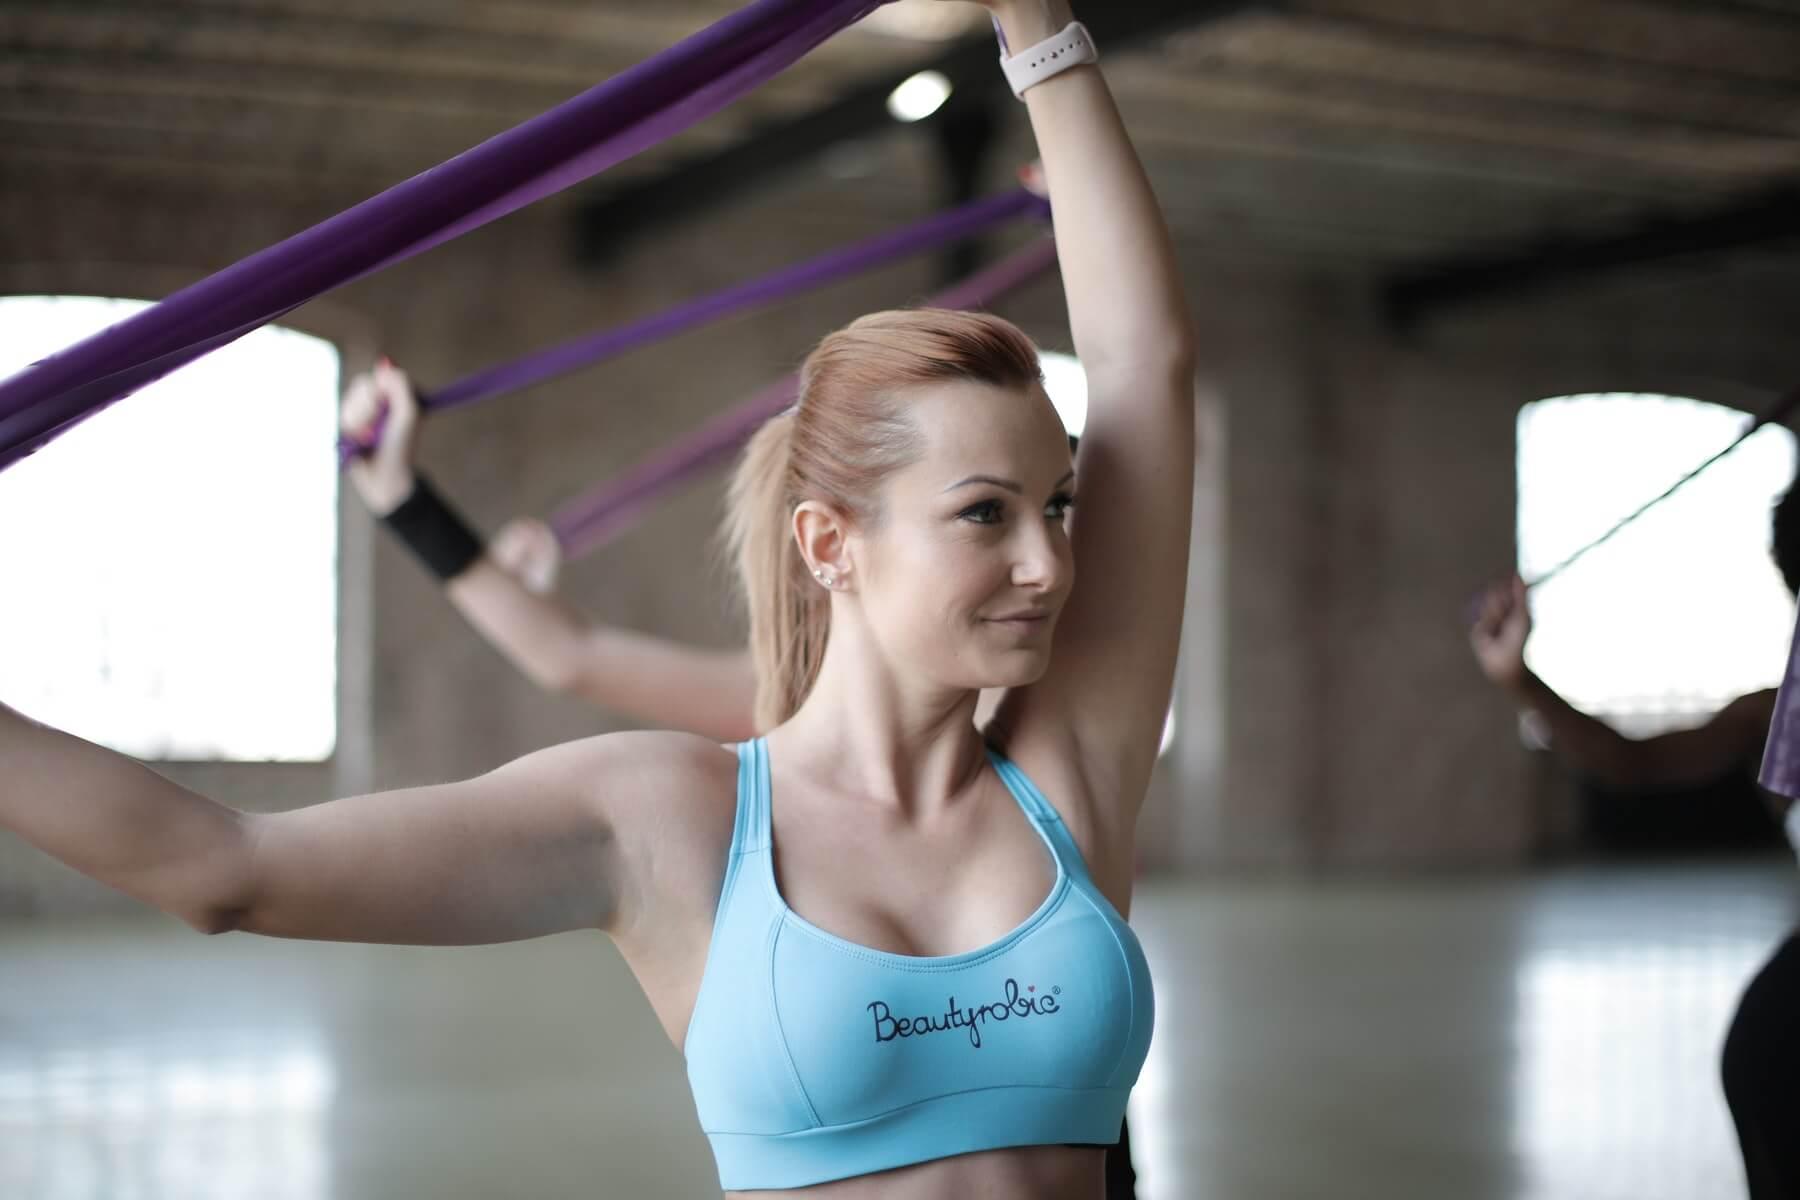 rutina de ejercicios para mujeres con bandas elásticas